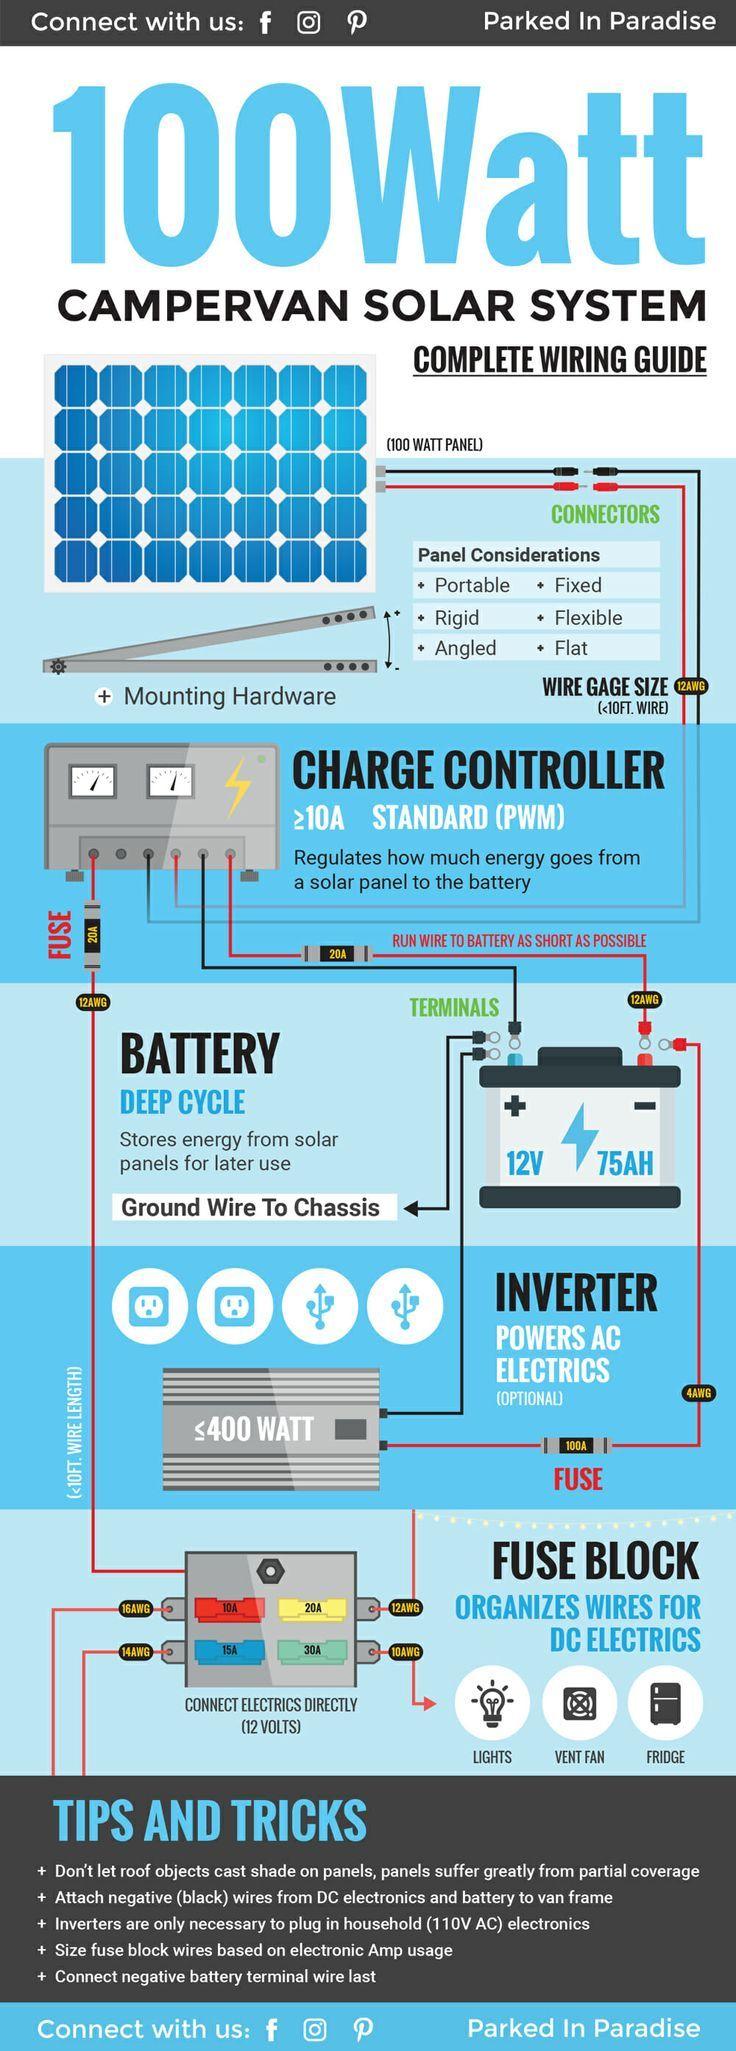 Solar Calculator and DIY Wiring Diagrams | Solar panel ...